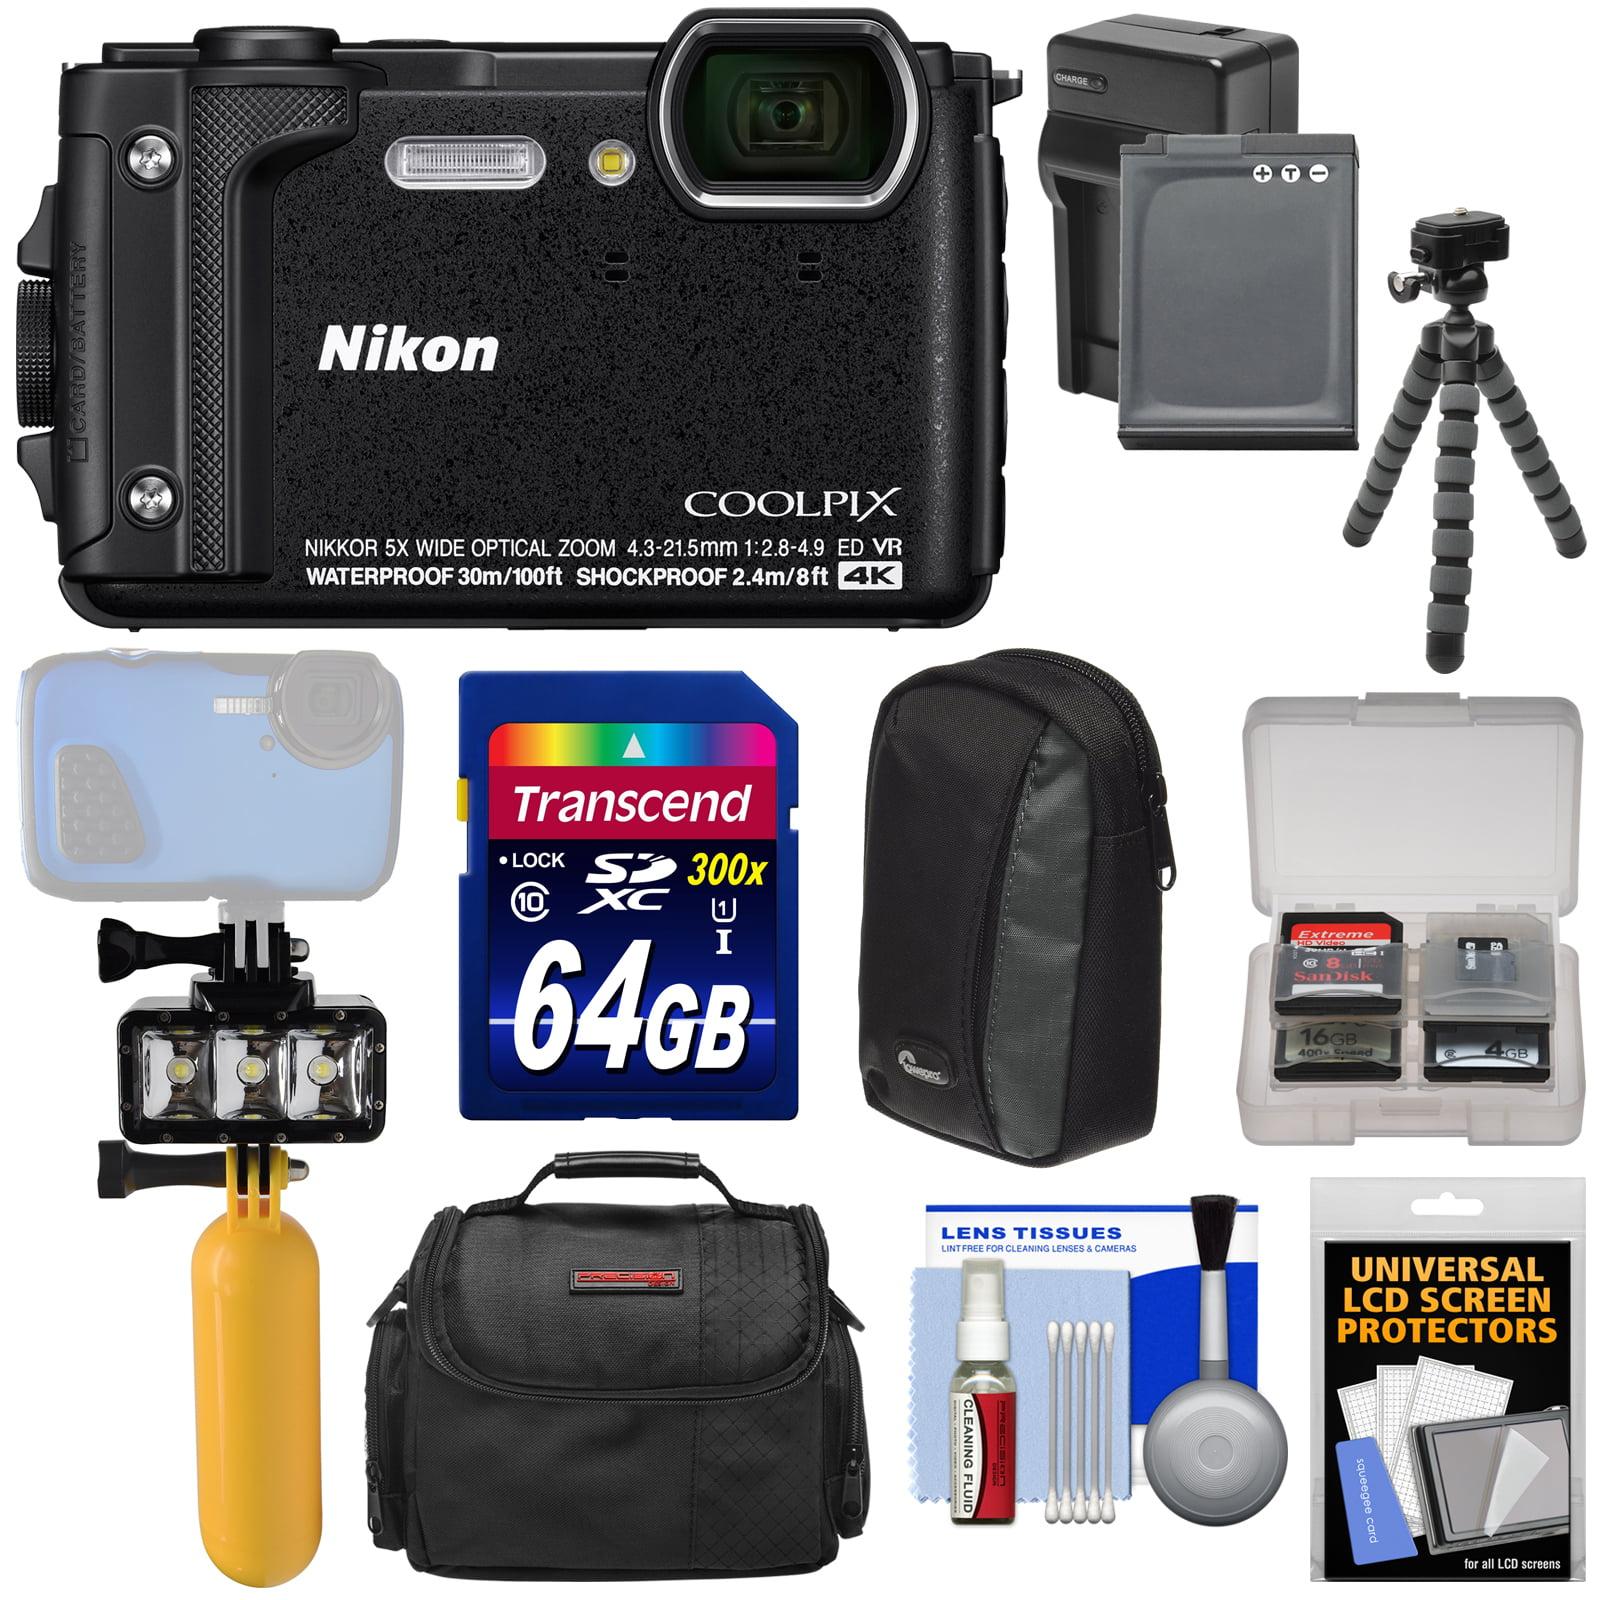 Nikon Coolpix W300 4K Wi-Fi Shock & Waterproof Digital Camera (Black) + 64GB Card + Battery & Charger + Diving LED Video Light + Buoy + Cases + Tripod Kit